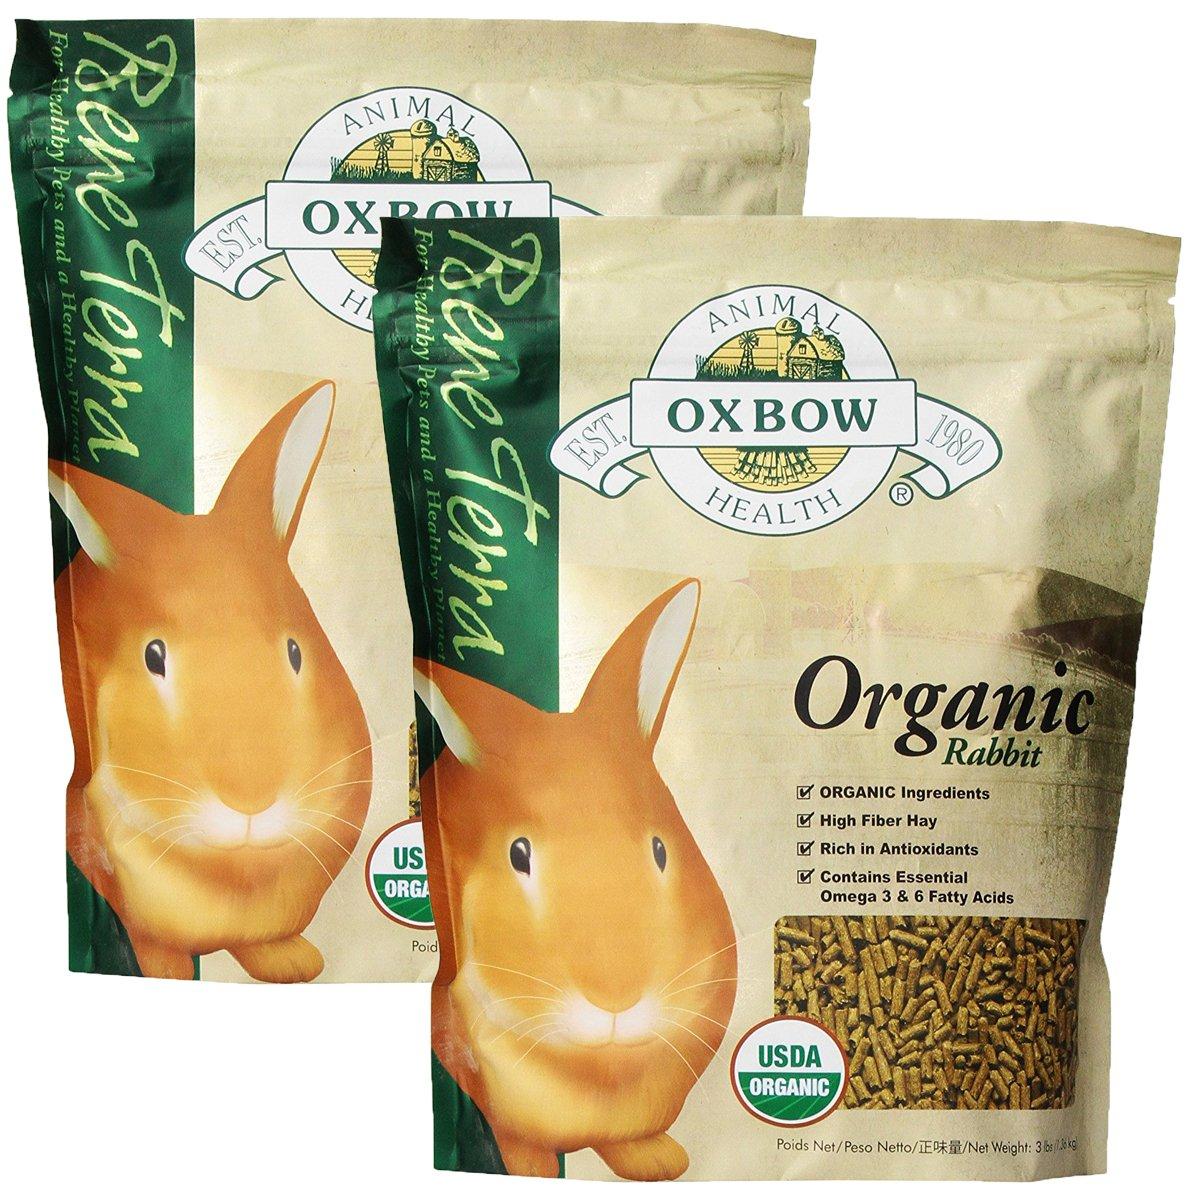 Oxbow Bene Terra Organic Rabbit Food, 6 lb by Oxbow